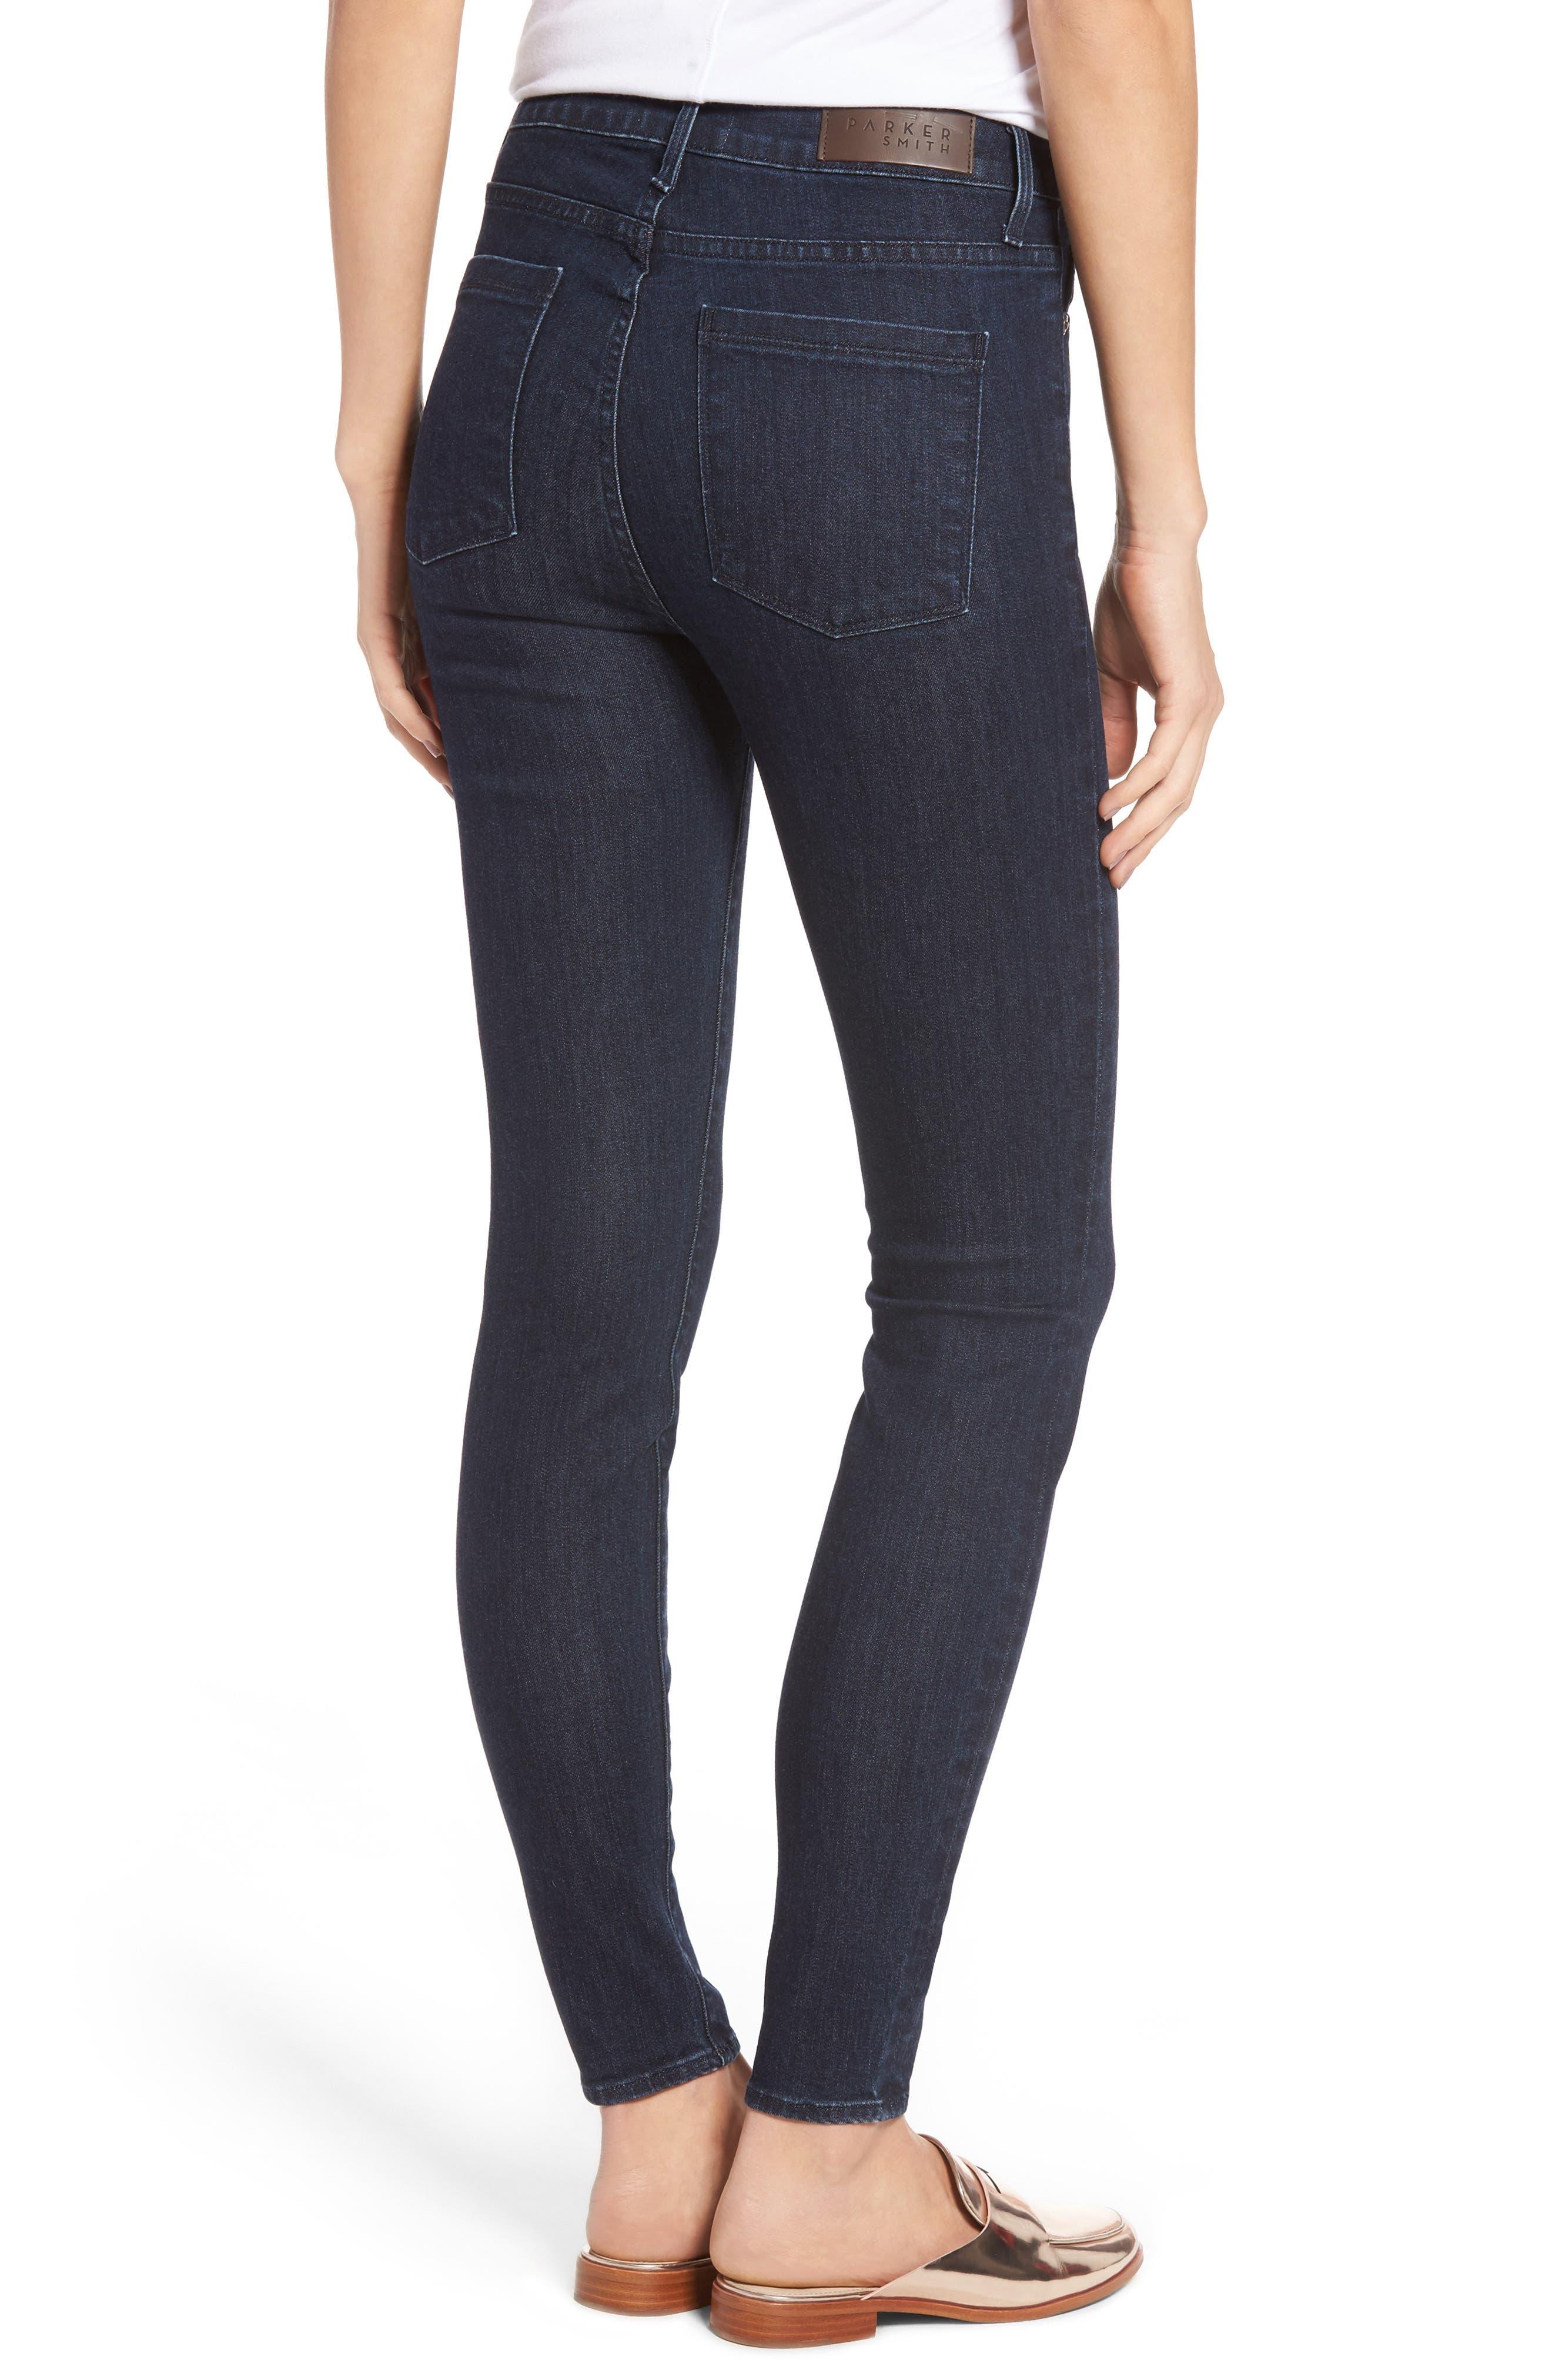 Bombshell High Waist Stretch Skinny Jeans,                             Alternate thumbnail 5, color,